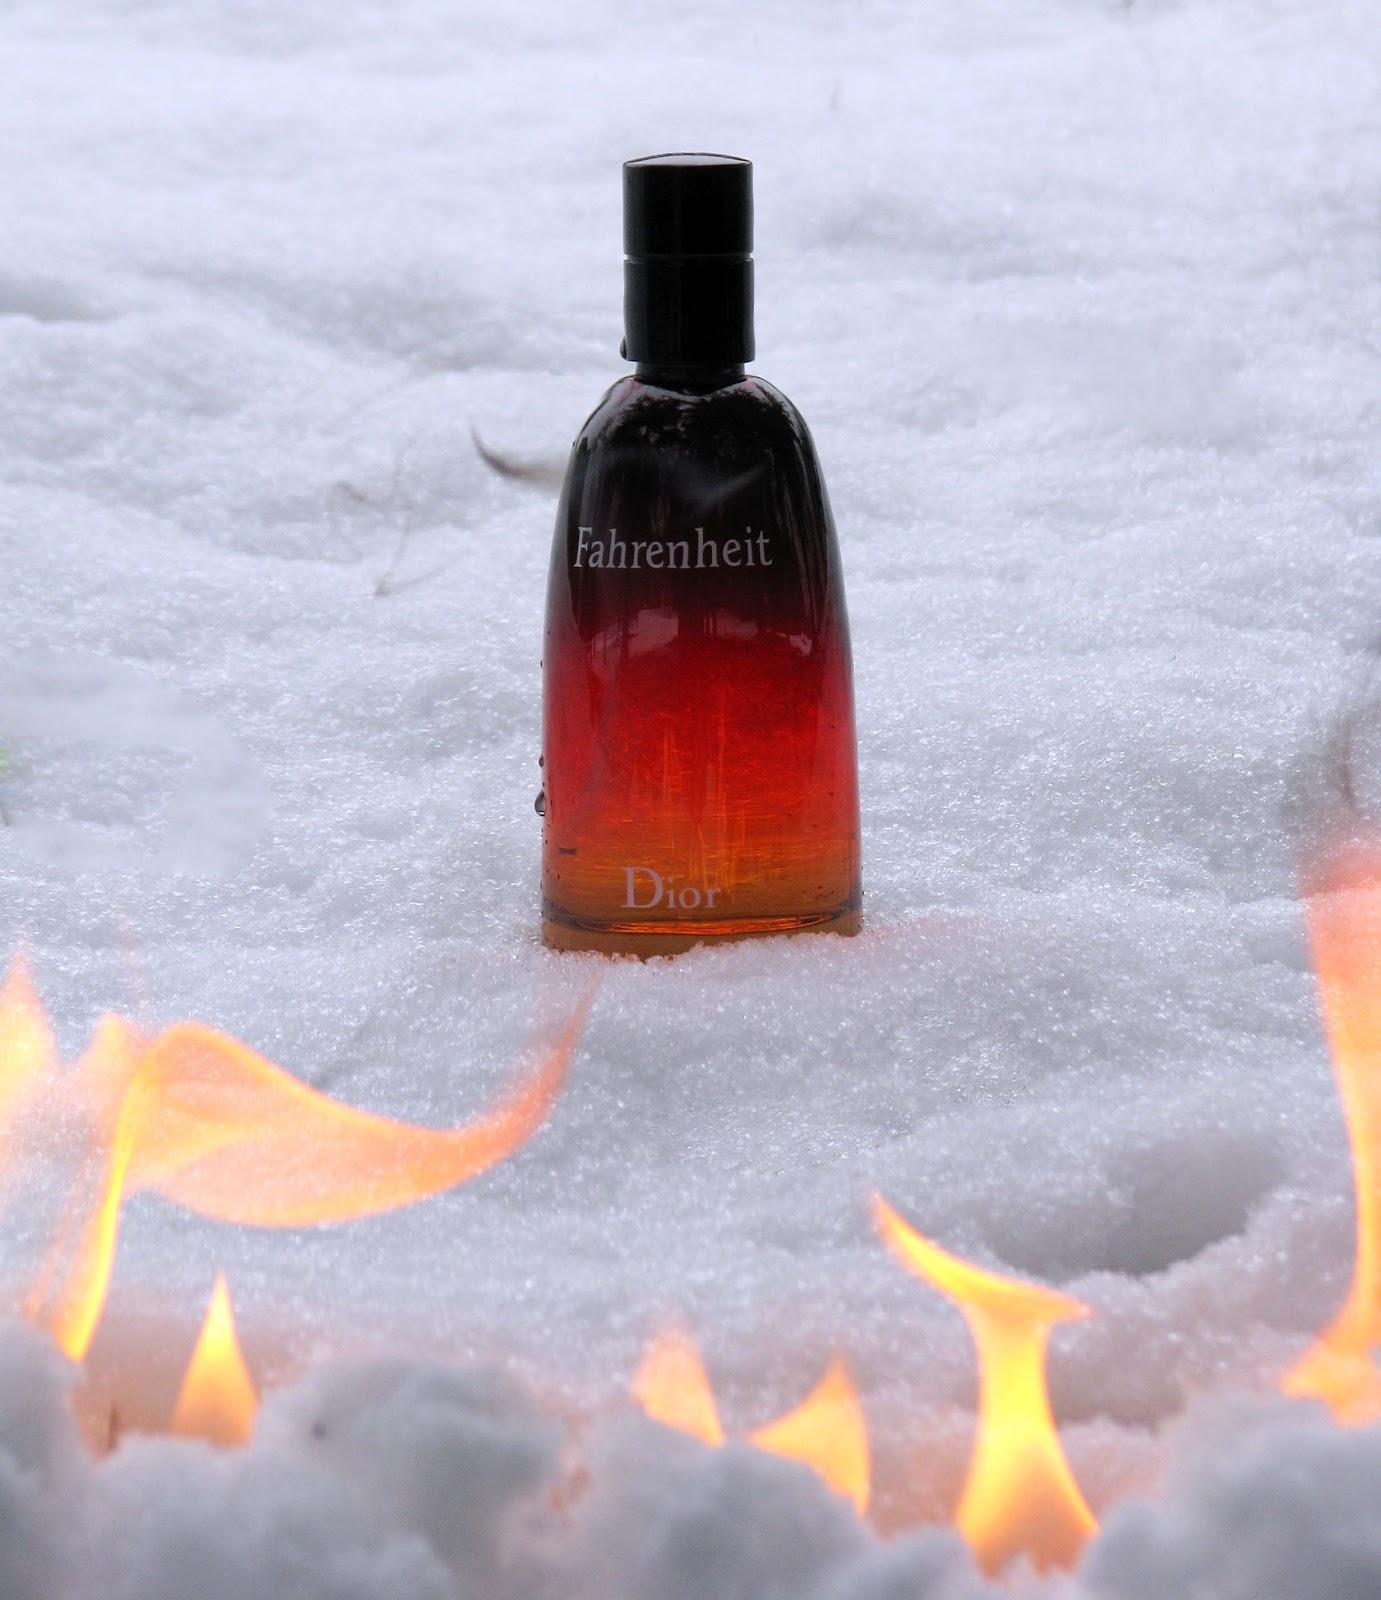 http://2.bp.blogspot.com/-2t_cFfYw0KQ/UR0hDhdWwiI/AAAAAAAANmM/4C4m4oTEEX8/s1600/fahrenheit_dior_homme_parfume_fragrance_perfume_25_anniversary_002.jpg